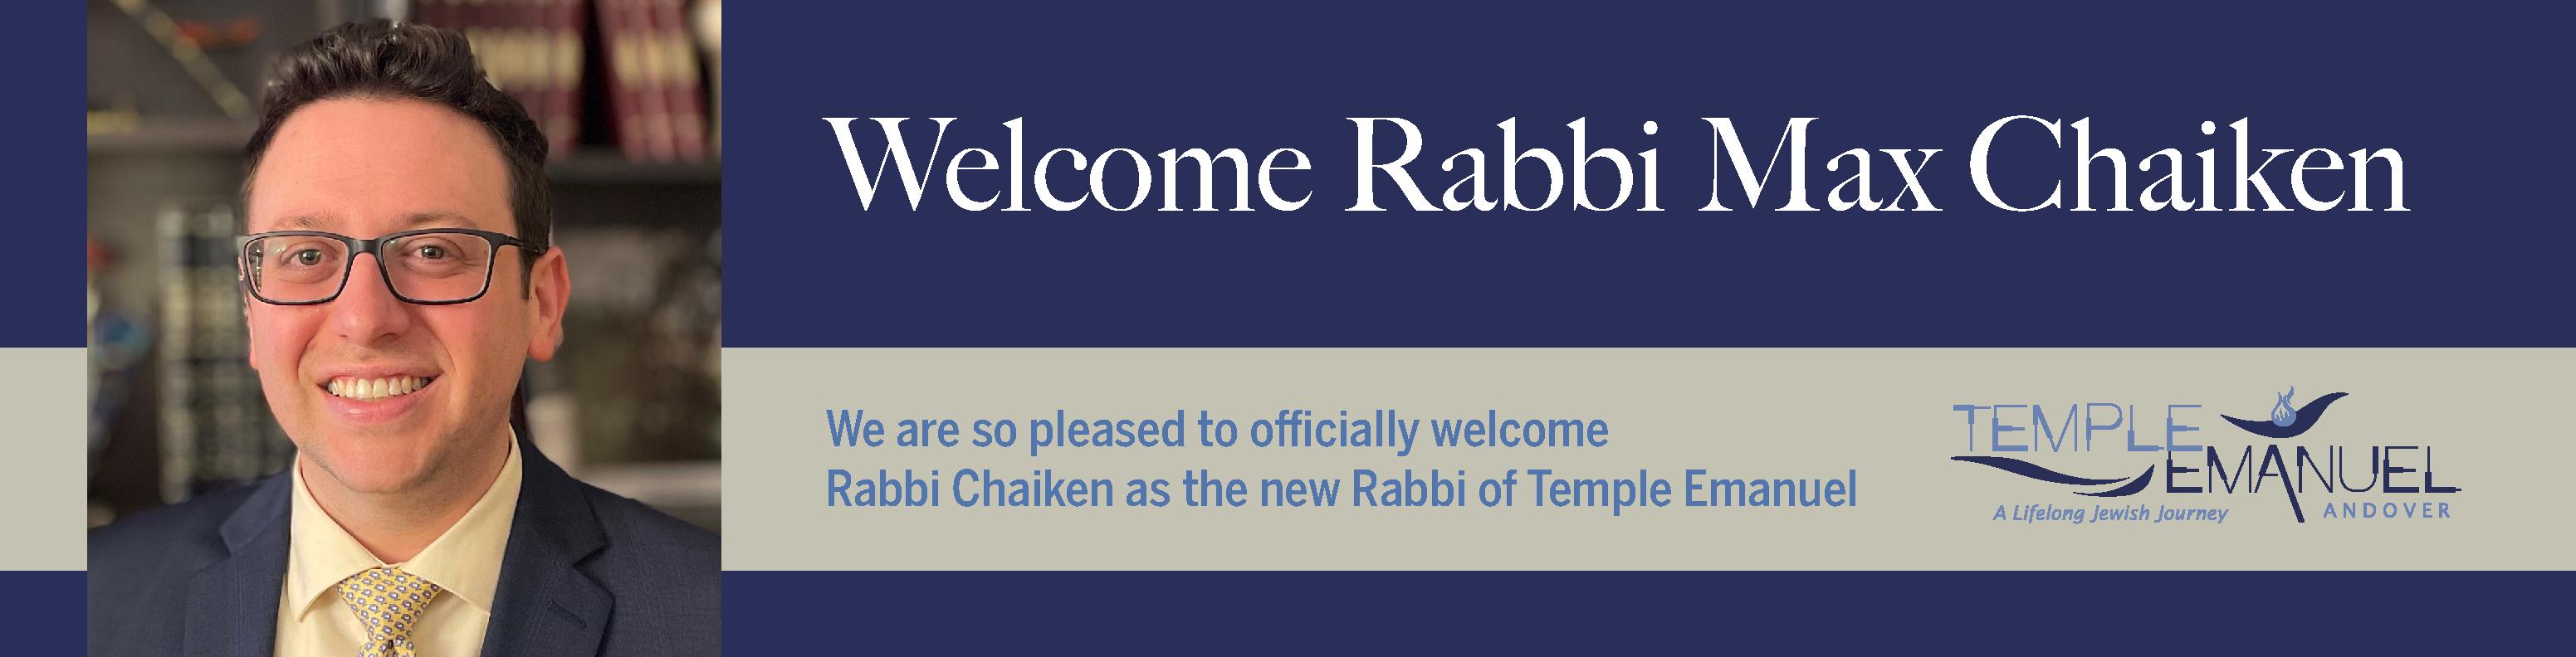 New Rabbi Web Banner (1)_Page_2